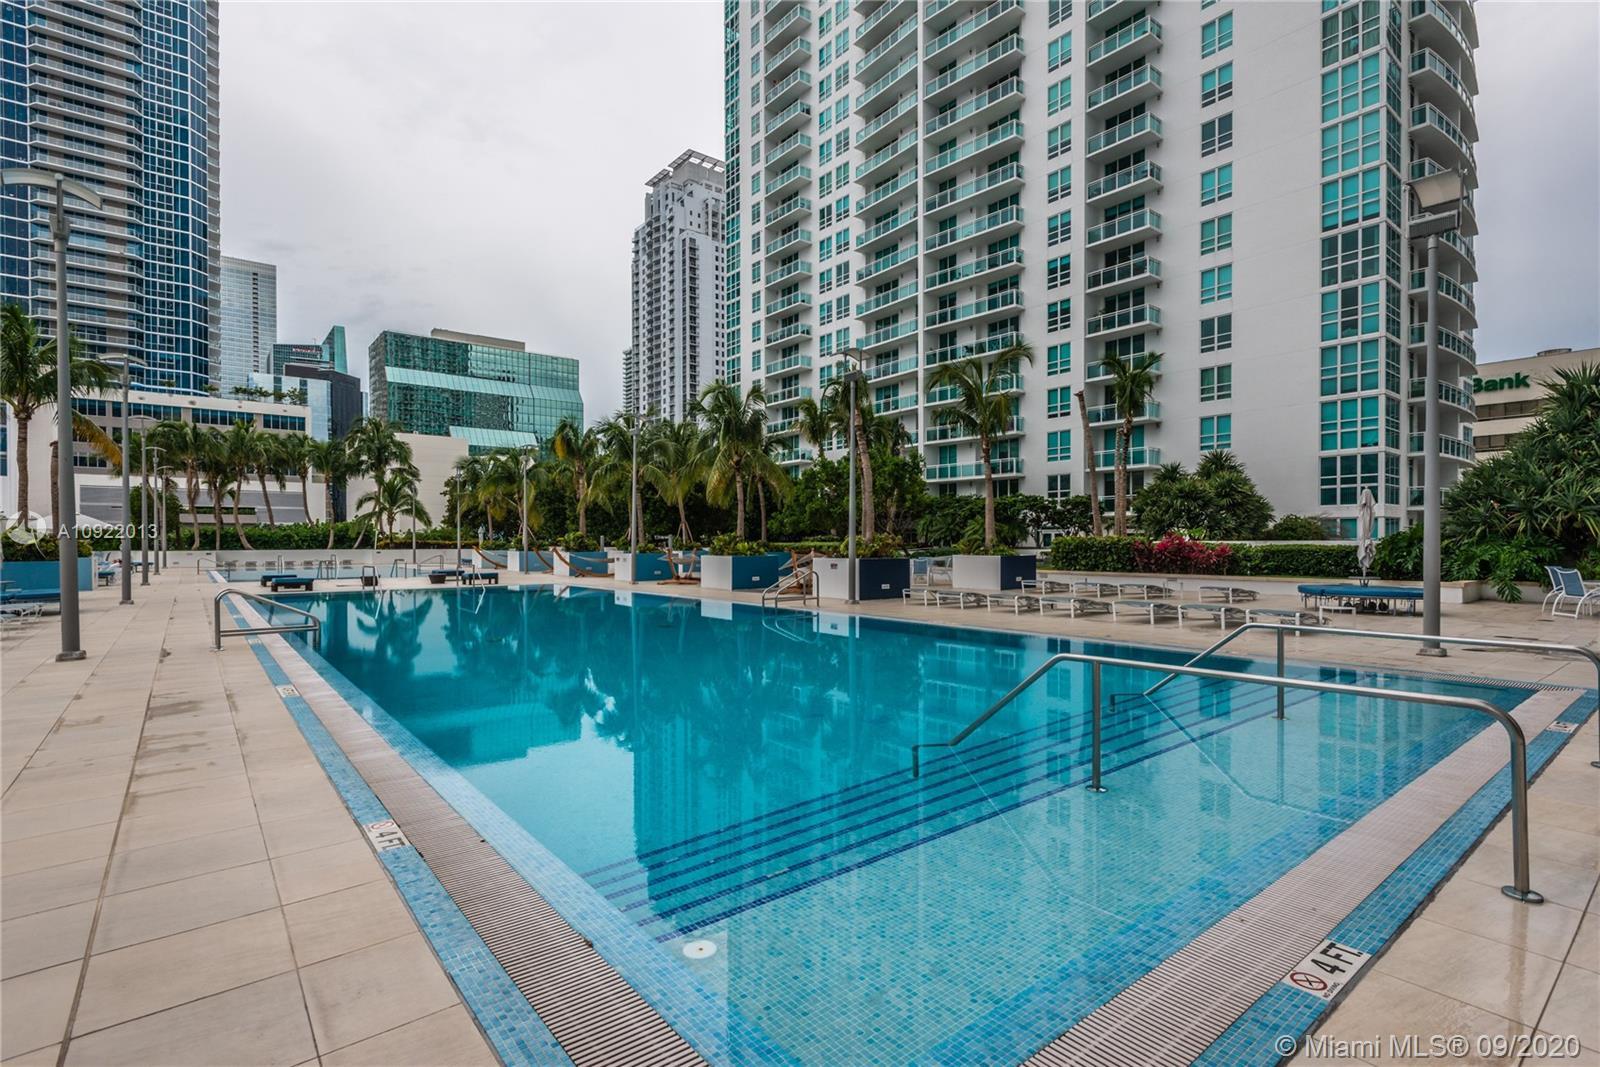 The Plaza on Brickell 1 #500 - 950 Brickell Bay Dr #500, Miami, FL 33131